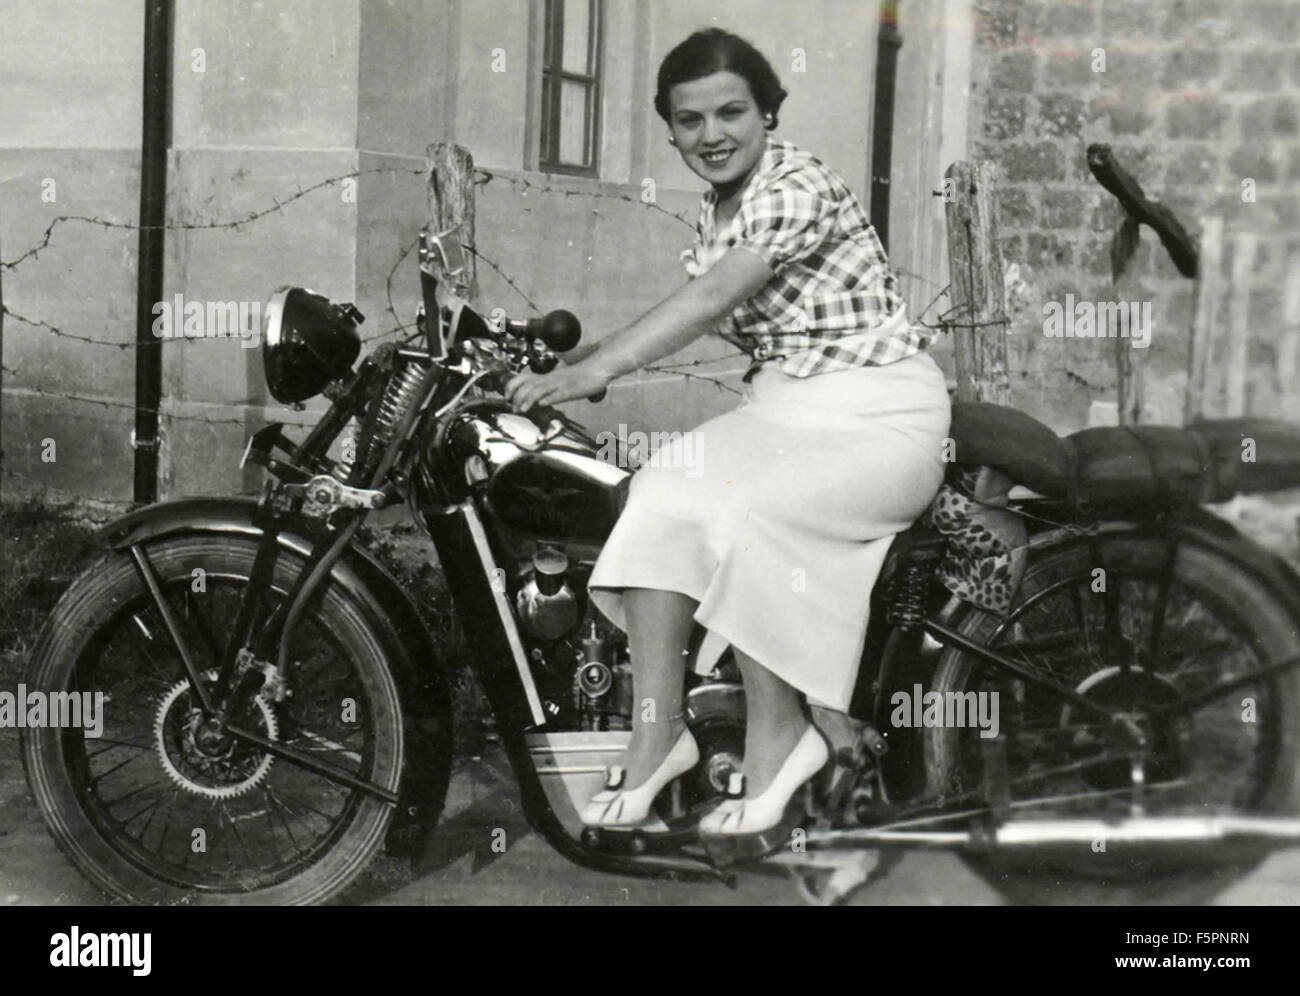 Women on Moto Guzzi motorbike, Italy - Stock Image